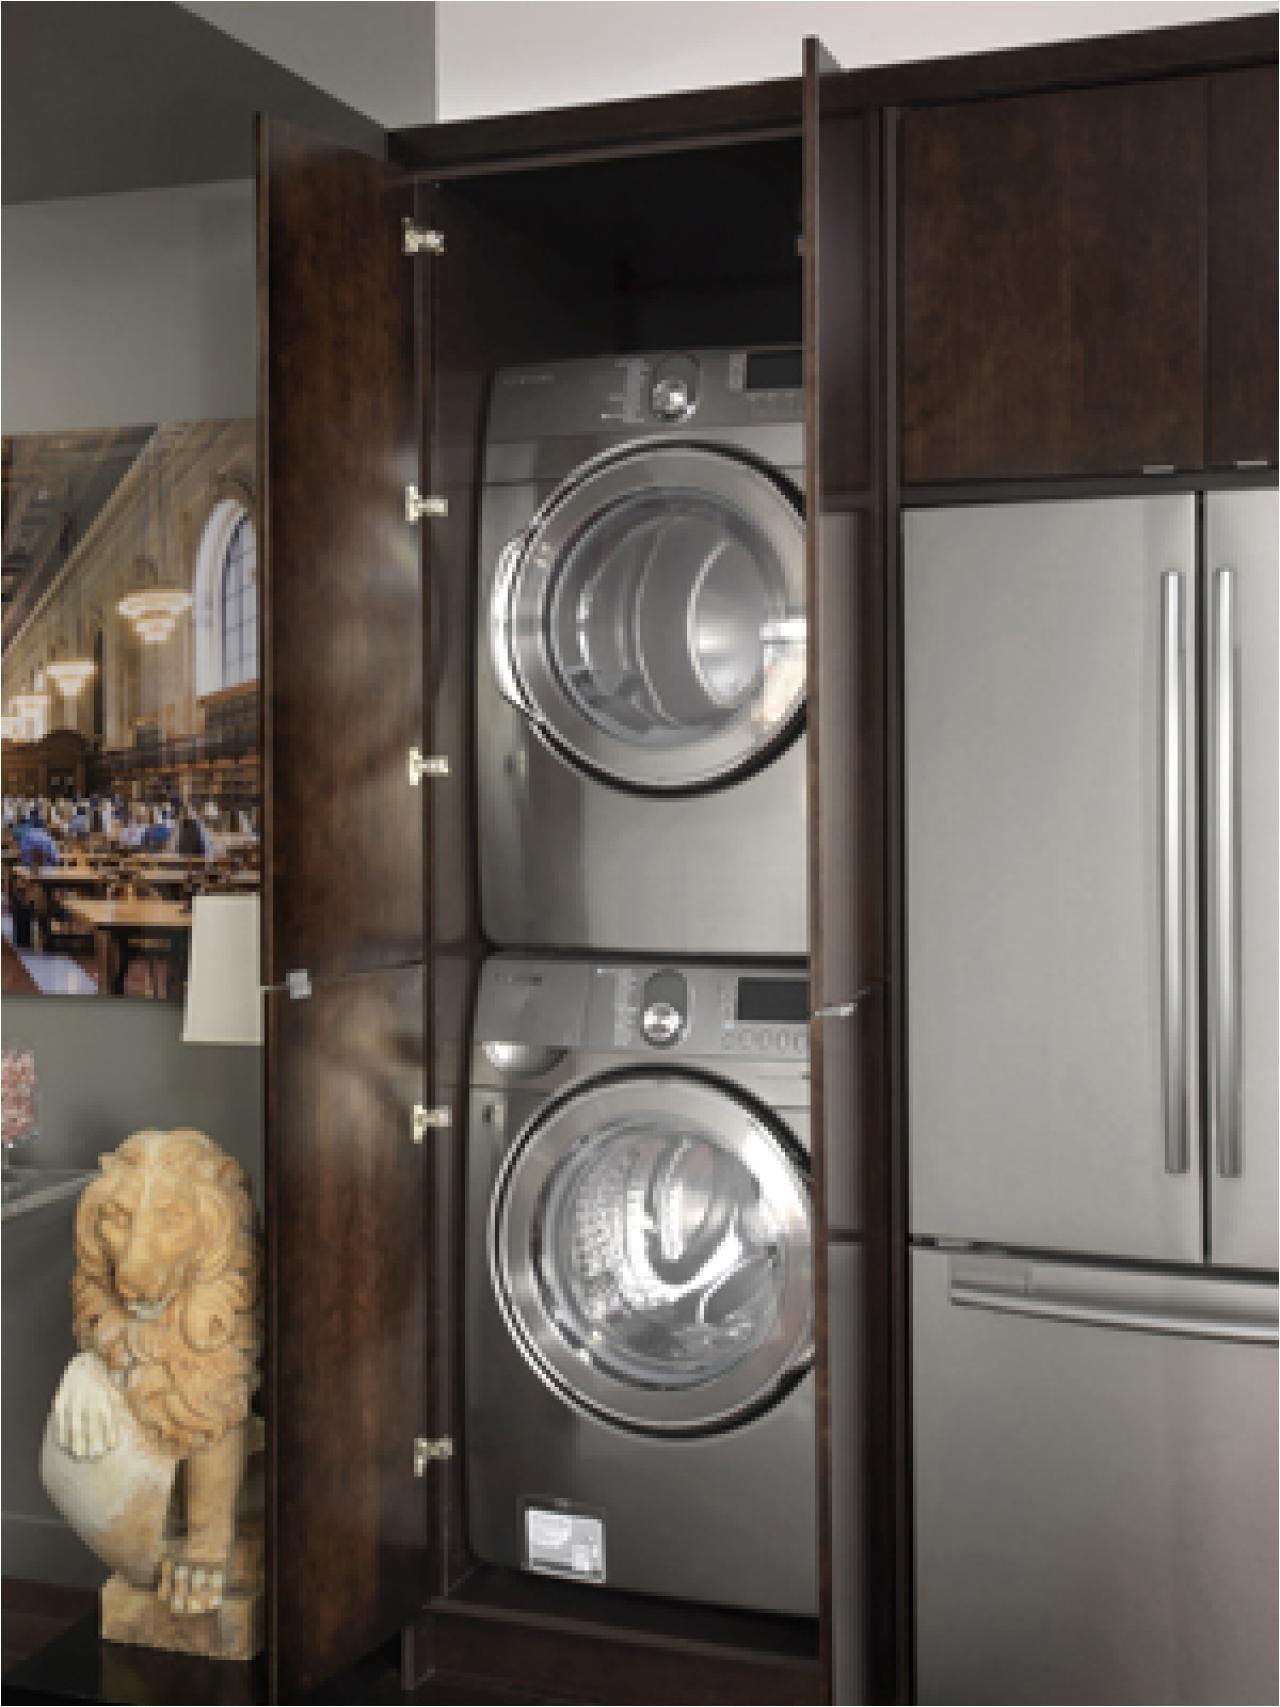 full size of kitchen shocking hide washer dryer inchen image design and cabinet doors wallpaper